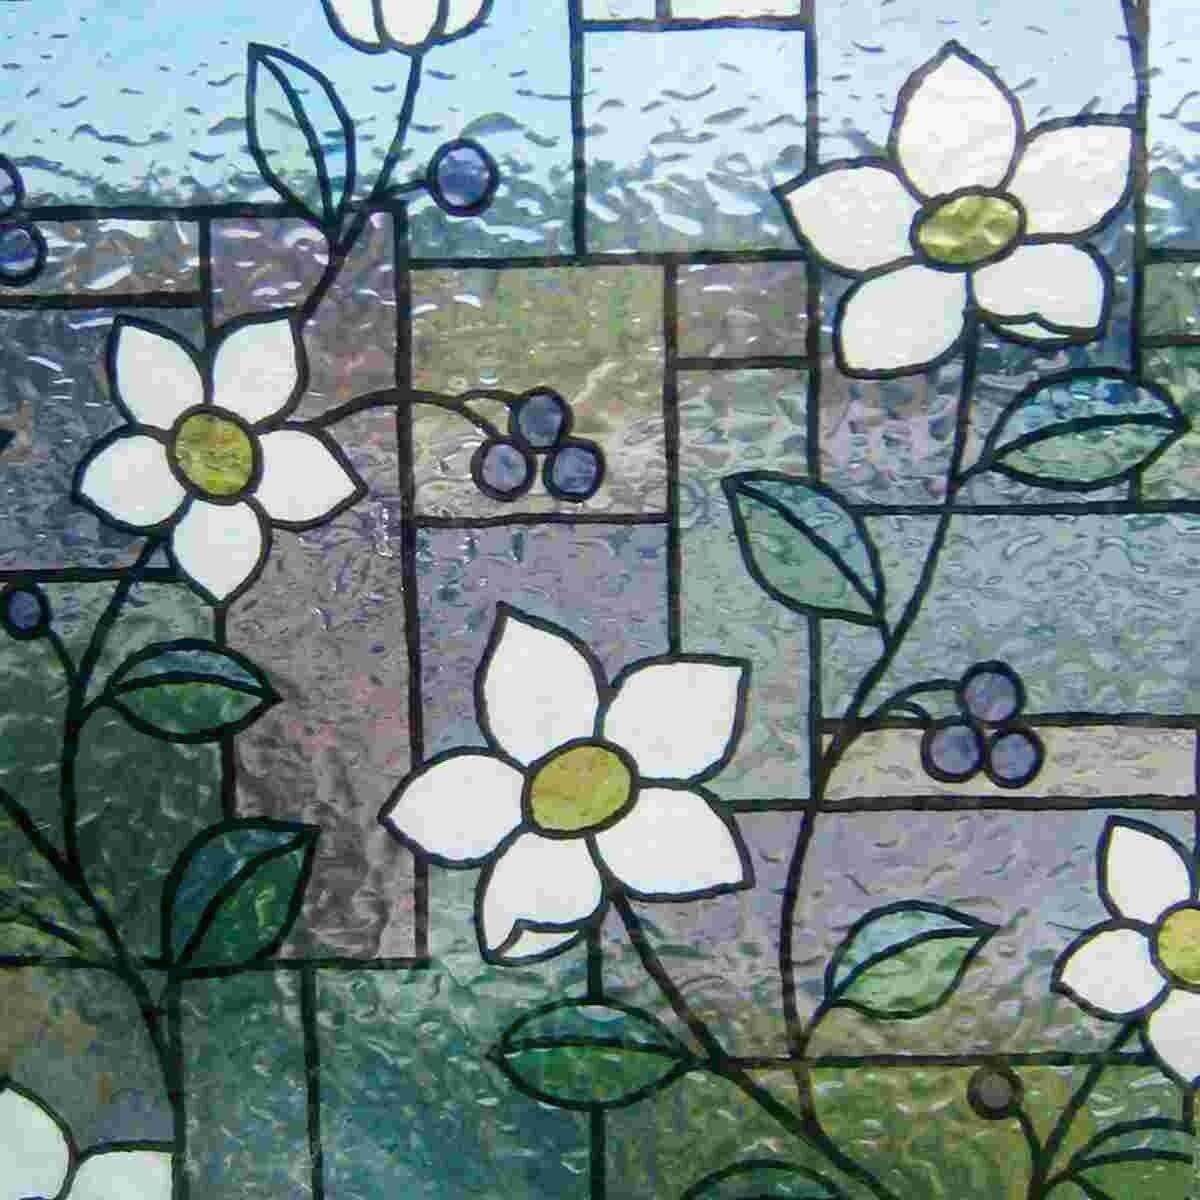 Lineafix estática ventana Diapositiva GLS 4657 flores altura 46 cm muchos tamaños glasdeko